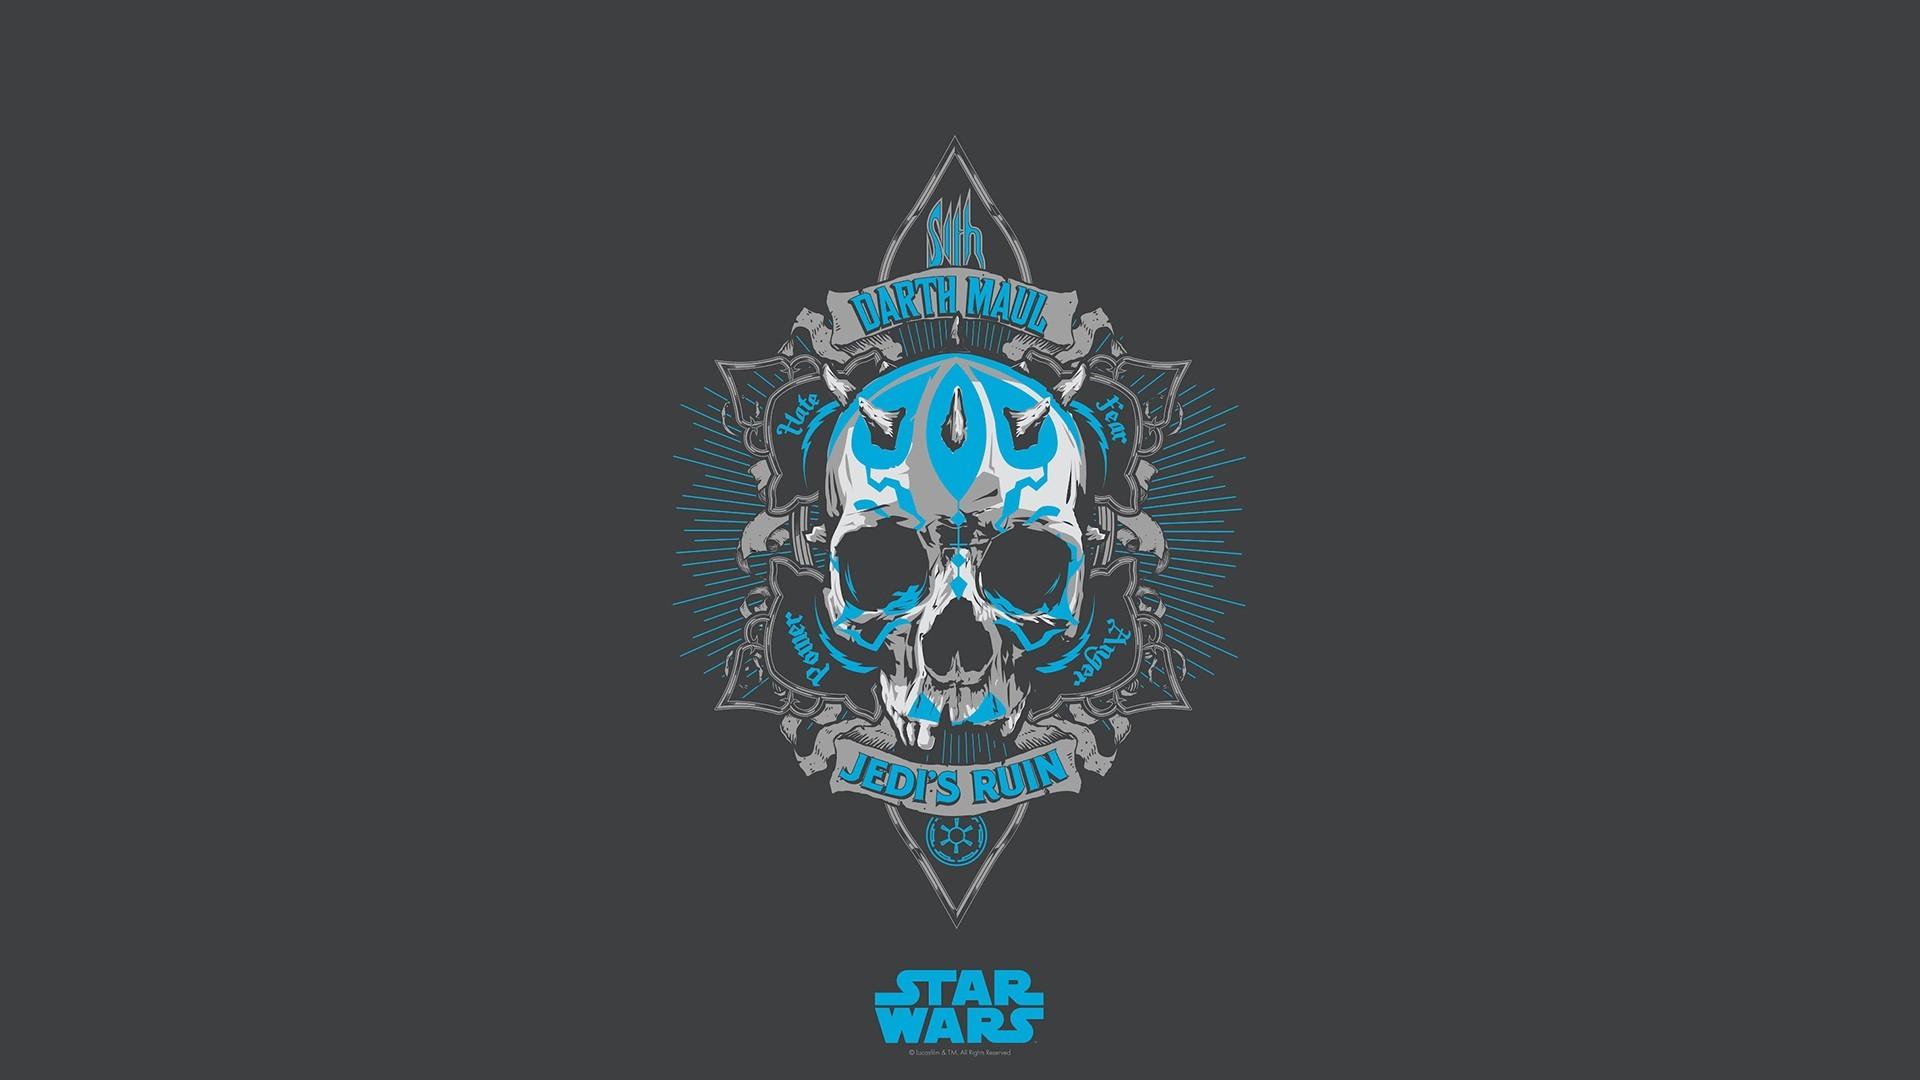 Darth Maul Fan Art George Lucas LucasArts Movies Sith Star Wars